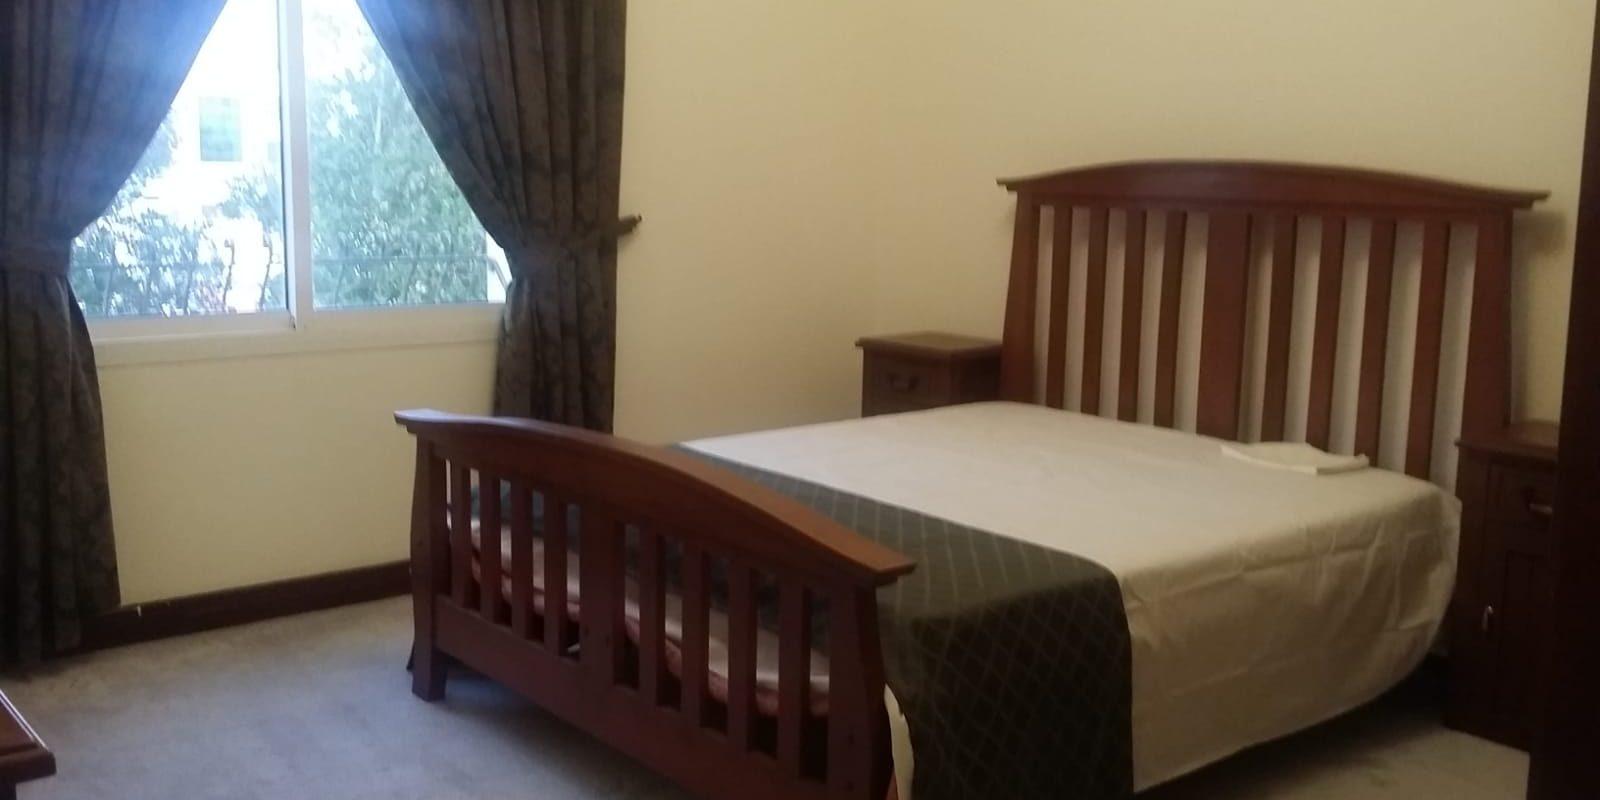 Fantastic 3 Bedroom Villa Compound in Juffair!